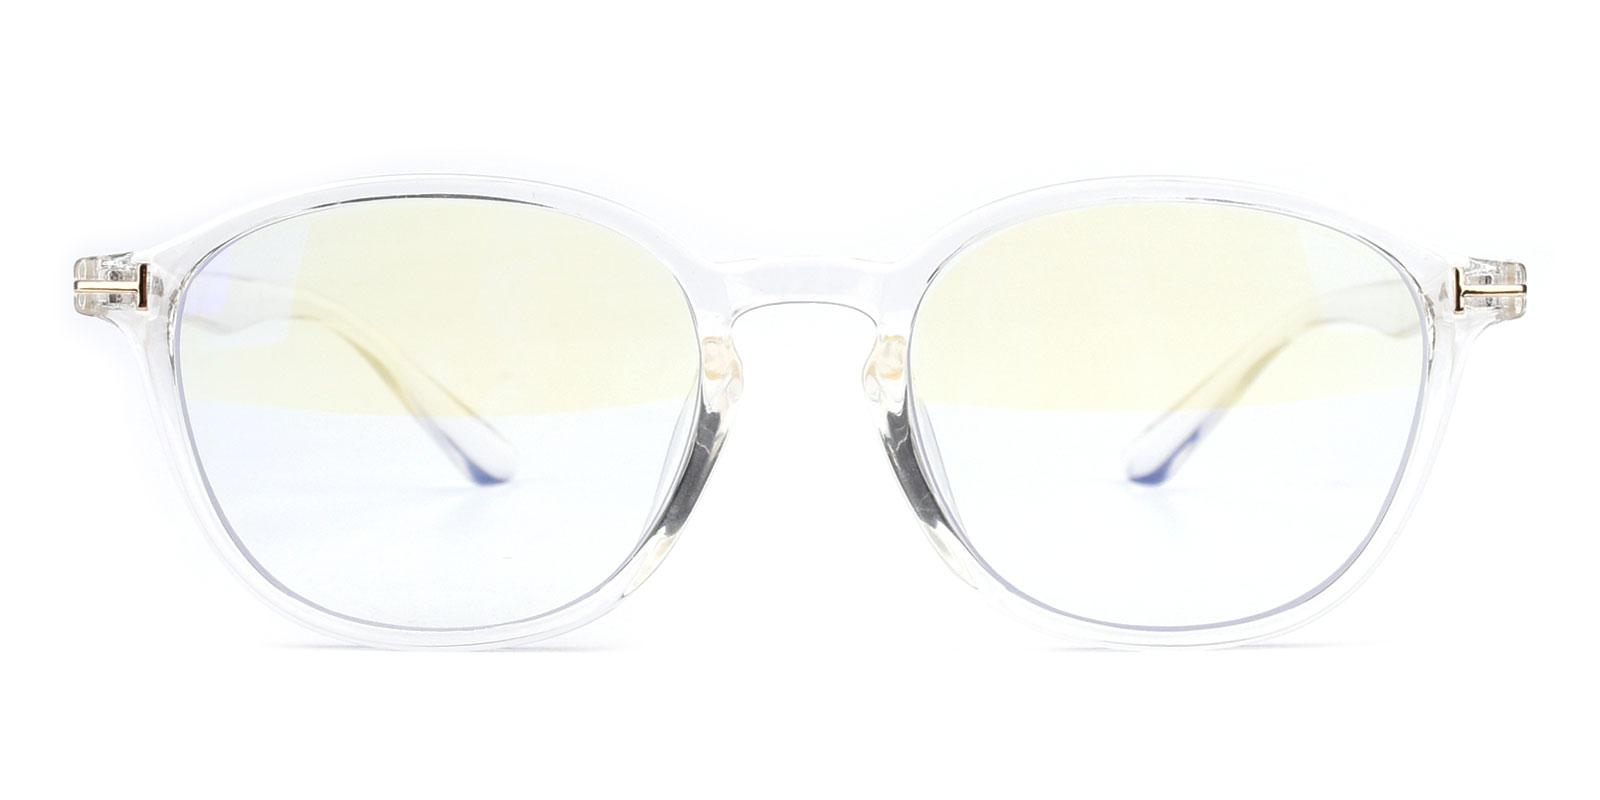 Rae-Translucent-Rectangle-TR-Eyeglasses-detail